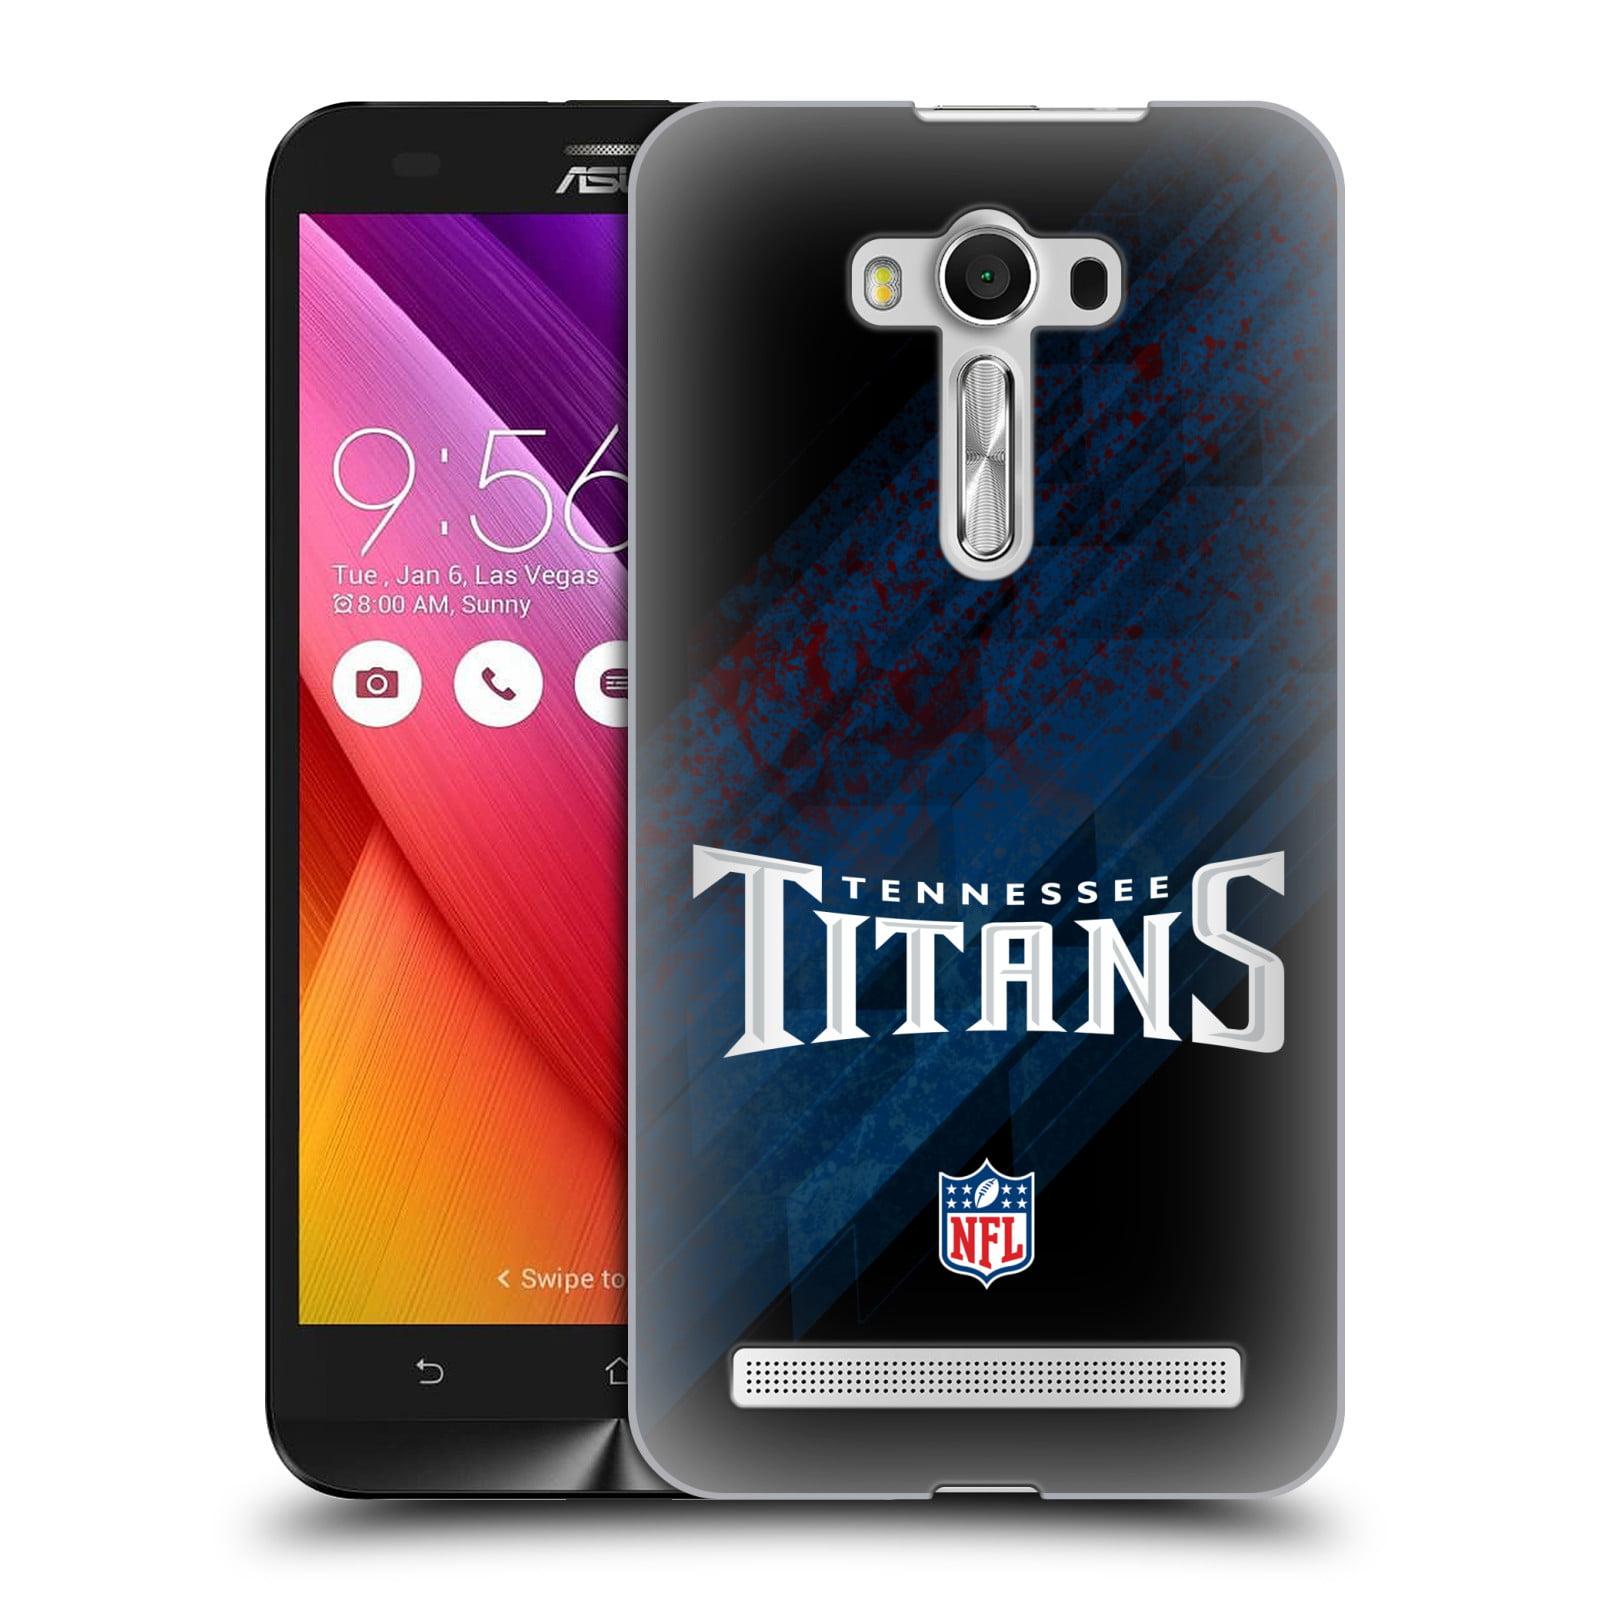 OFFICIAL NFL TENNESSEE TITANS LOGO HARD BACK CASE FOR ASUS ZENFONE PHONES